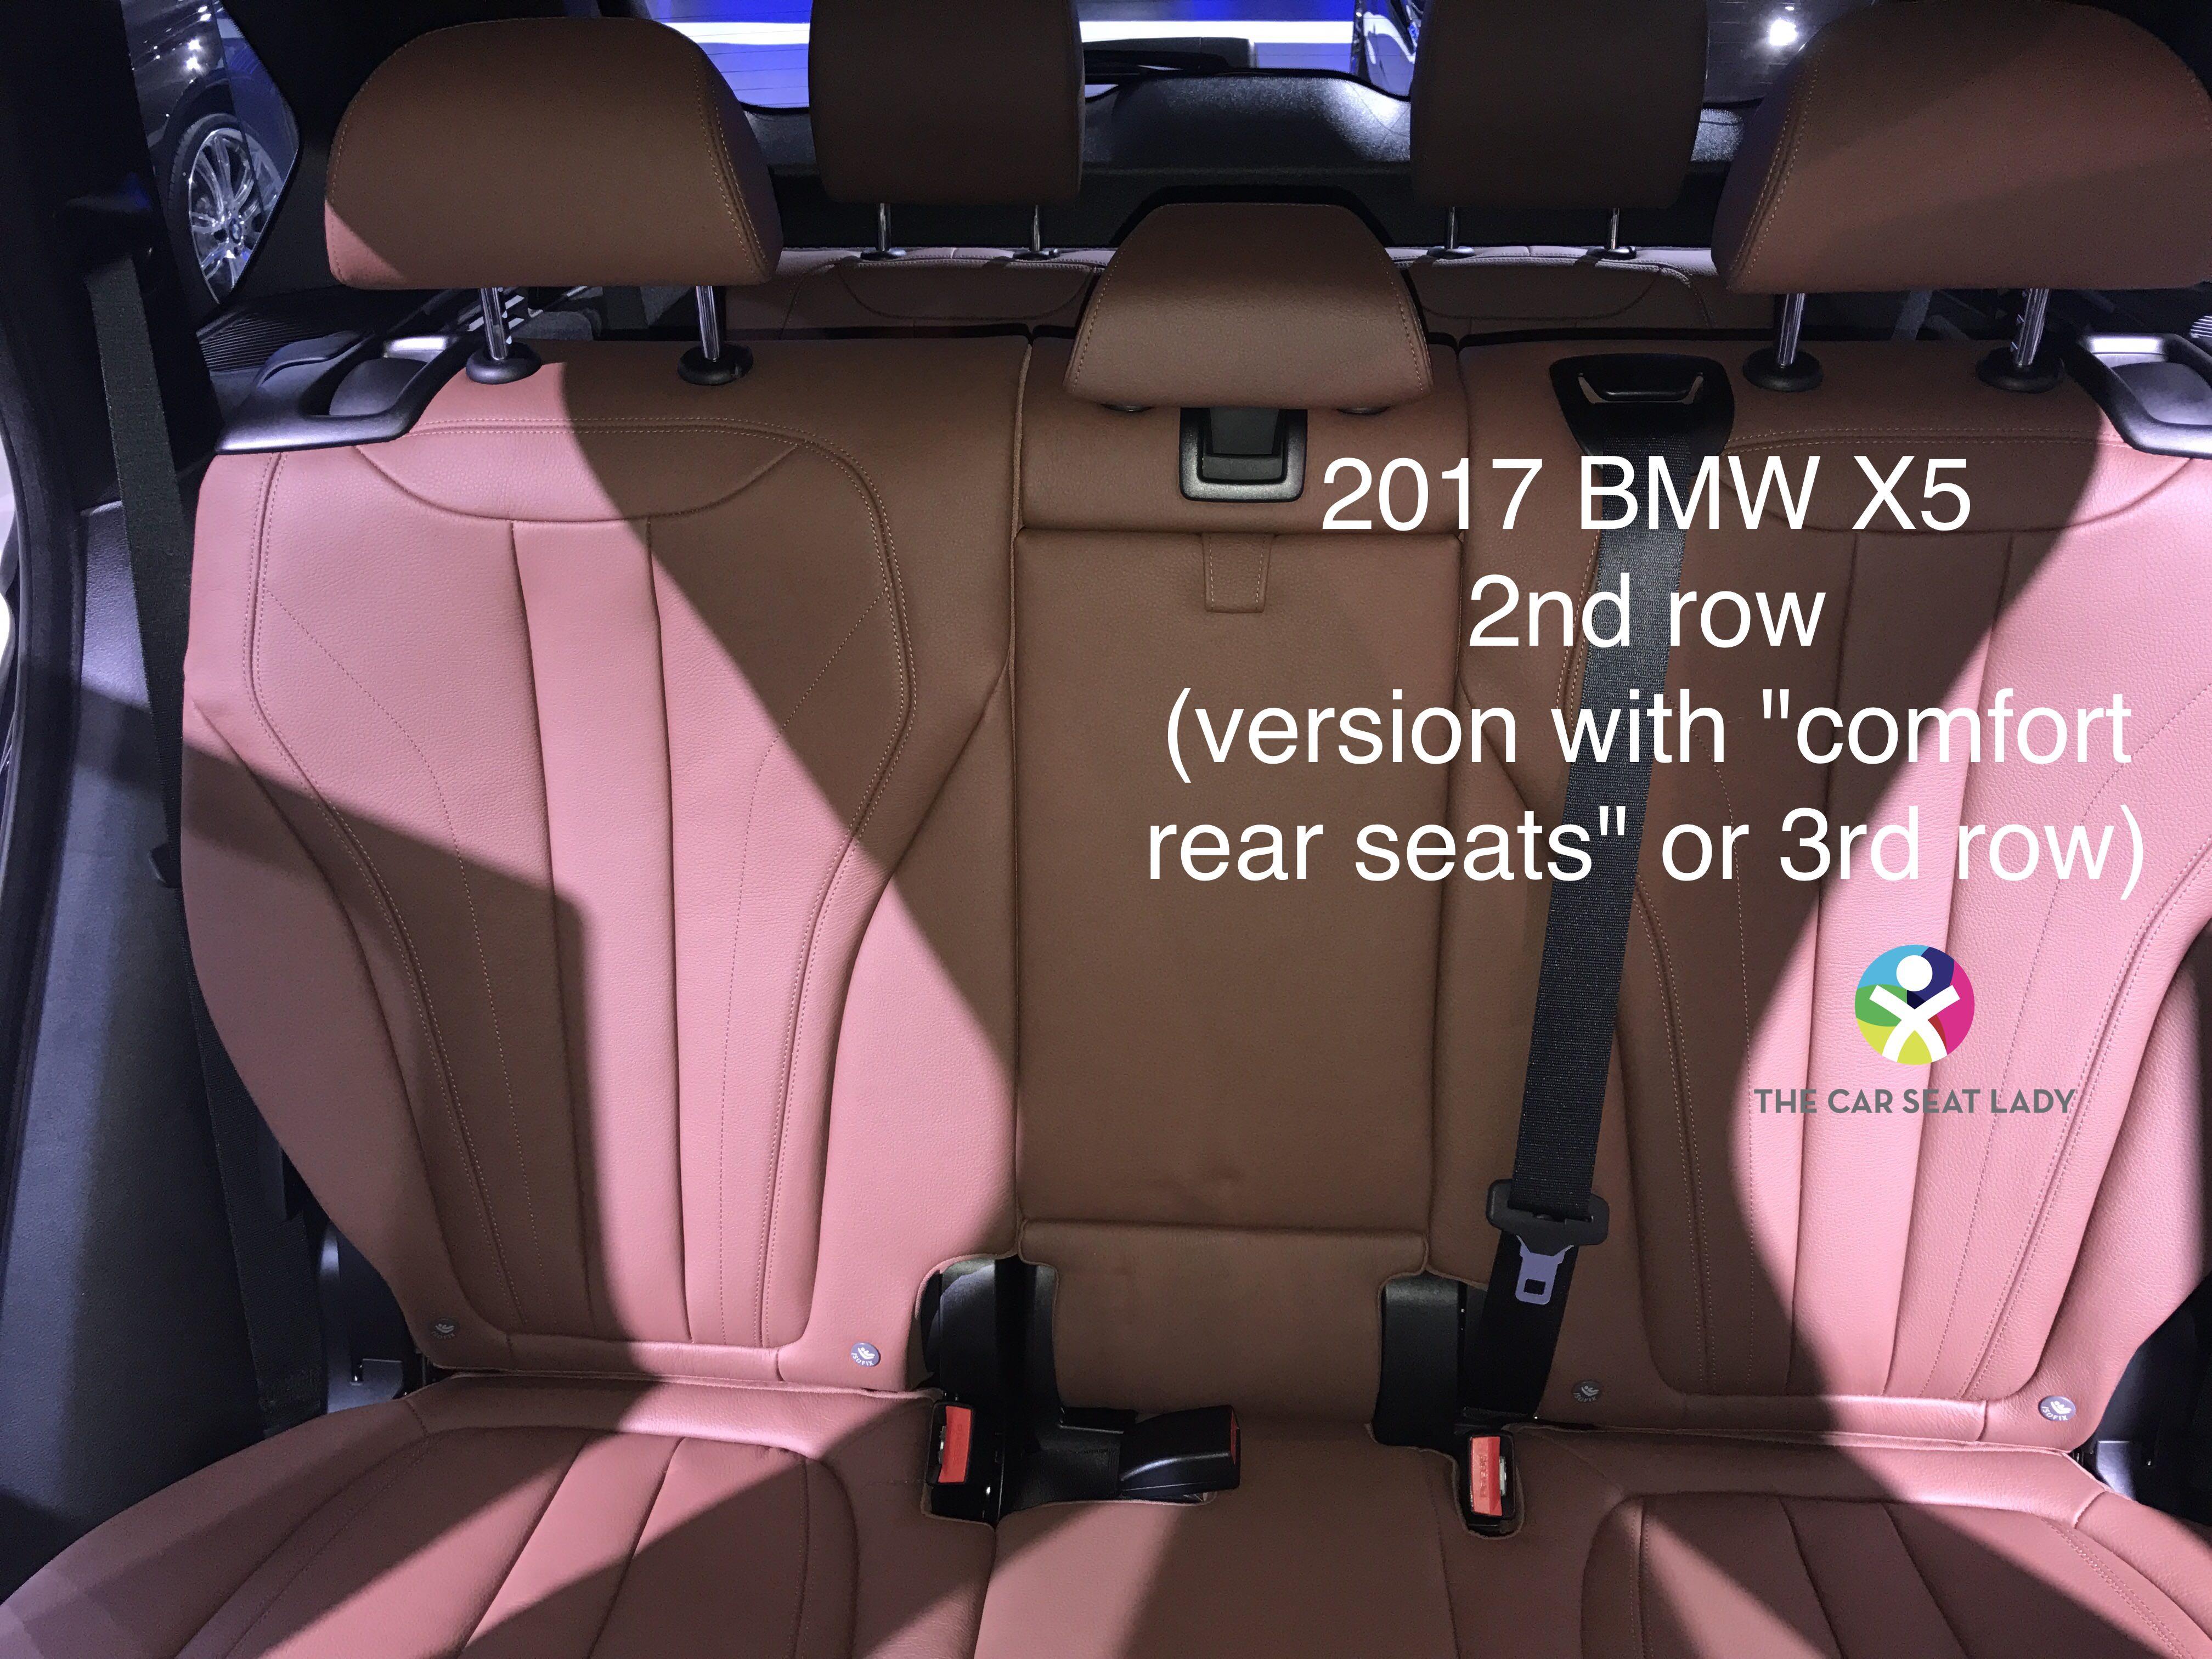 The Car Seat Ladybmw X5 The Car Seat Lady